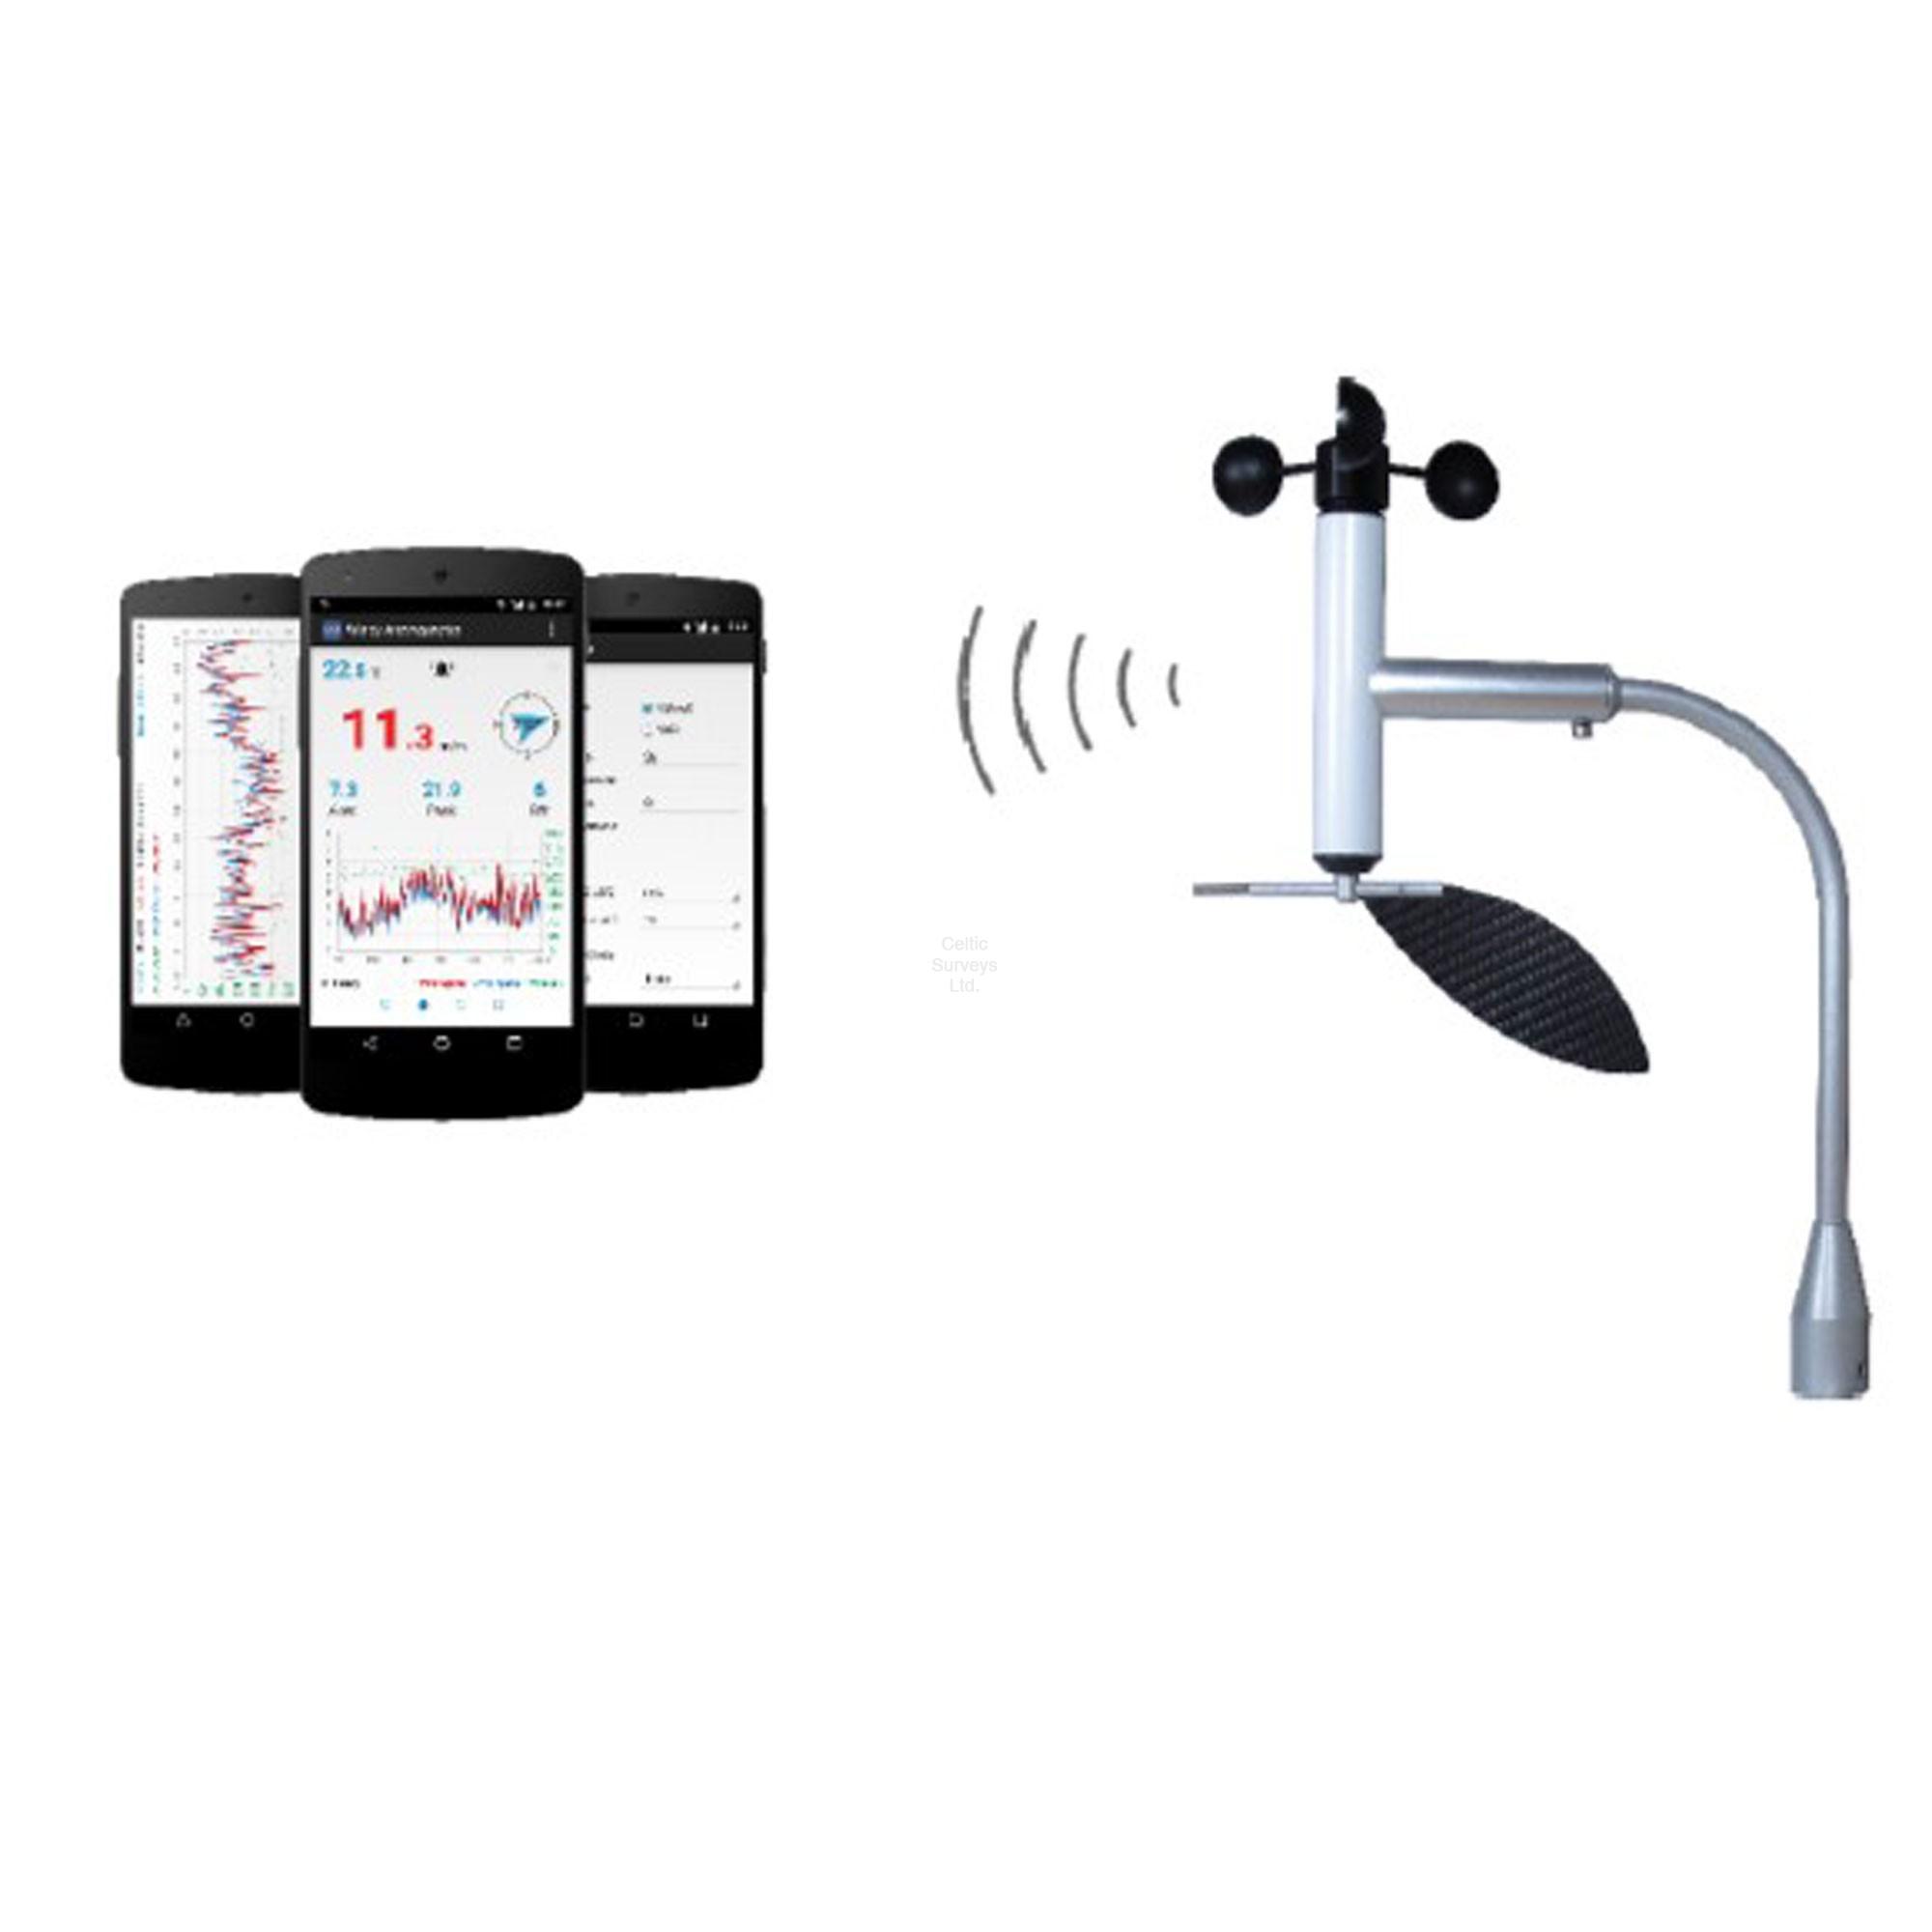 Navis Windy B Sd Smartphone Anemometer Measures Speed